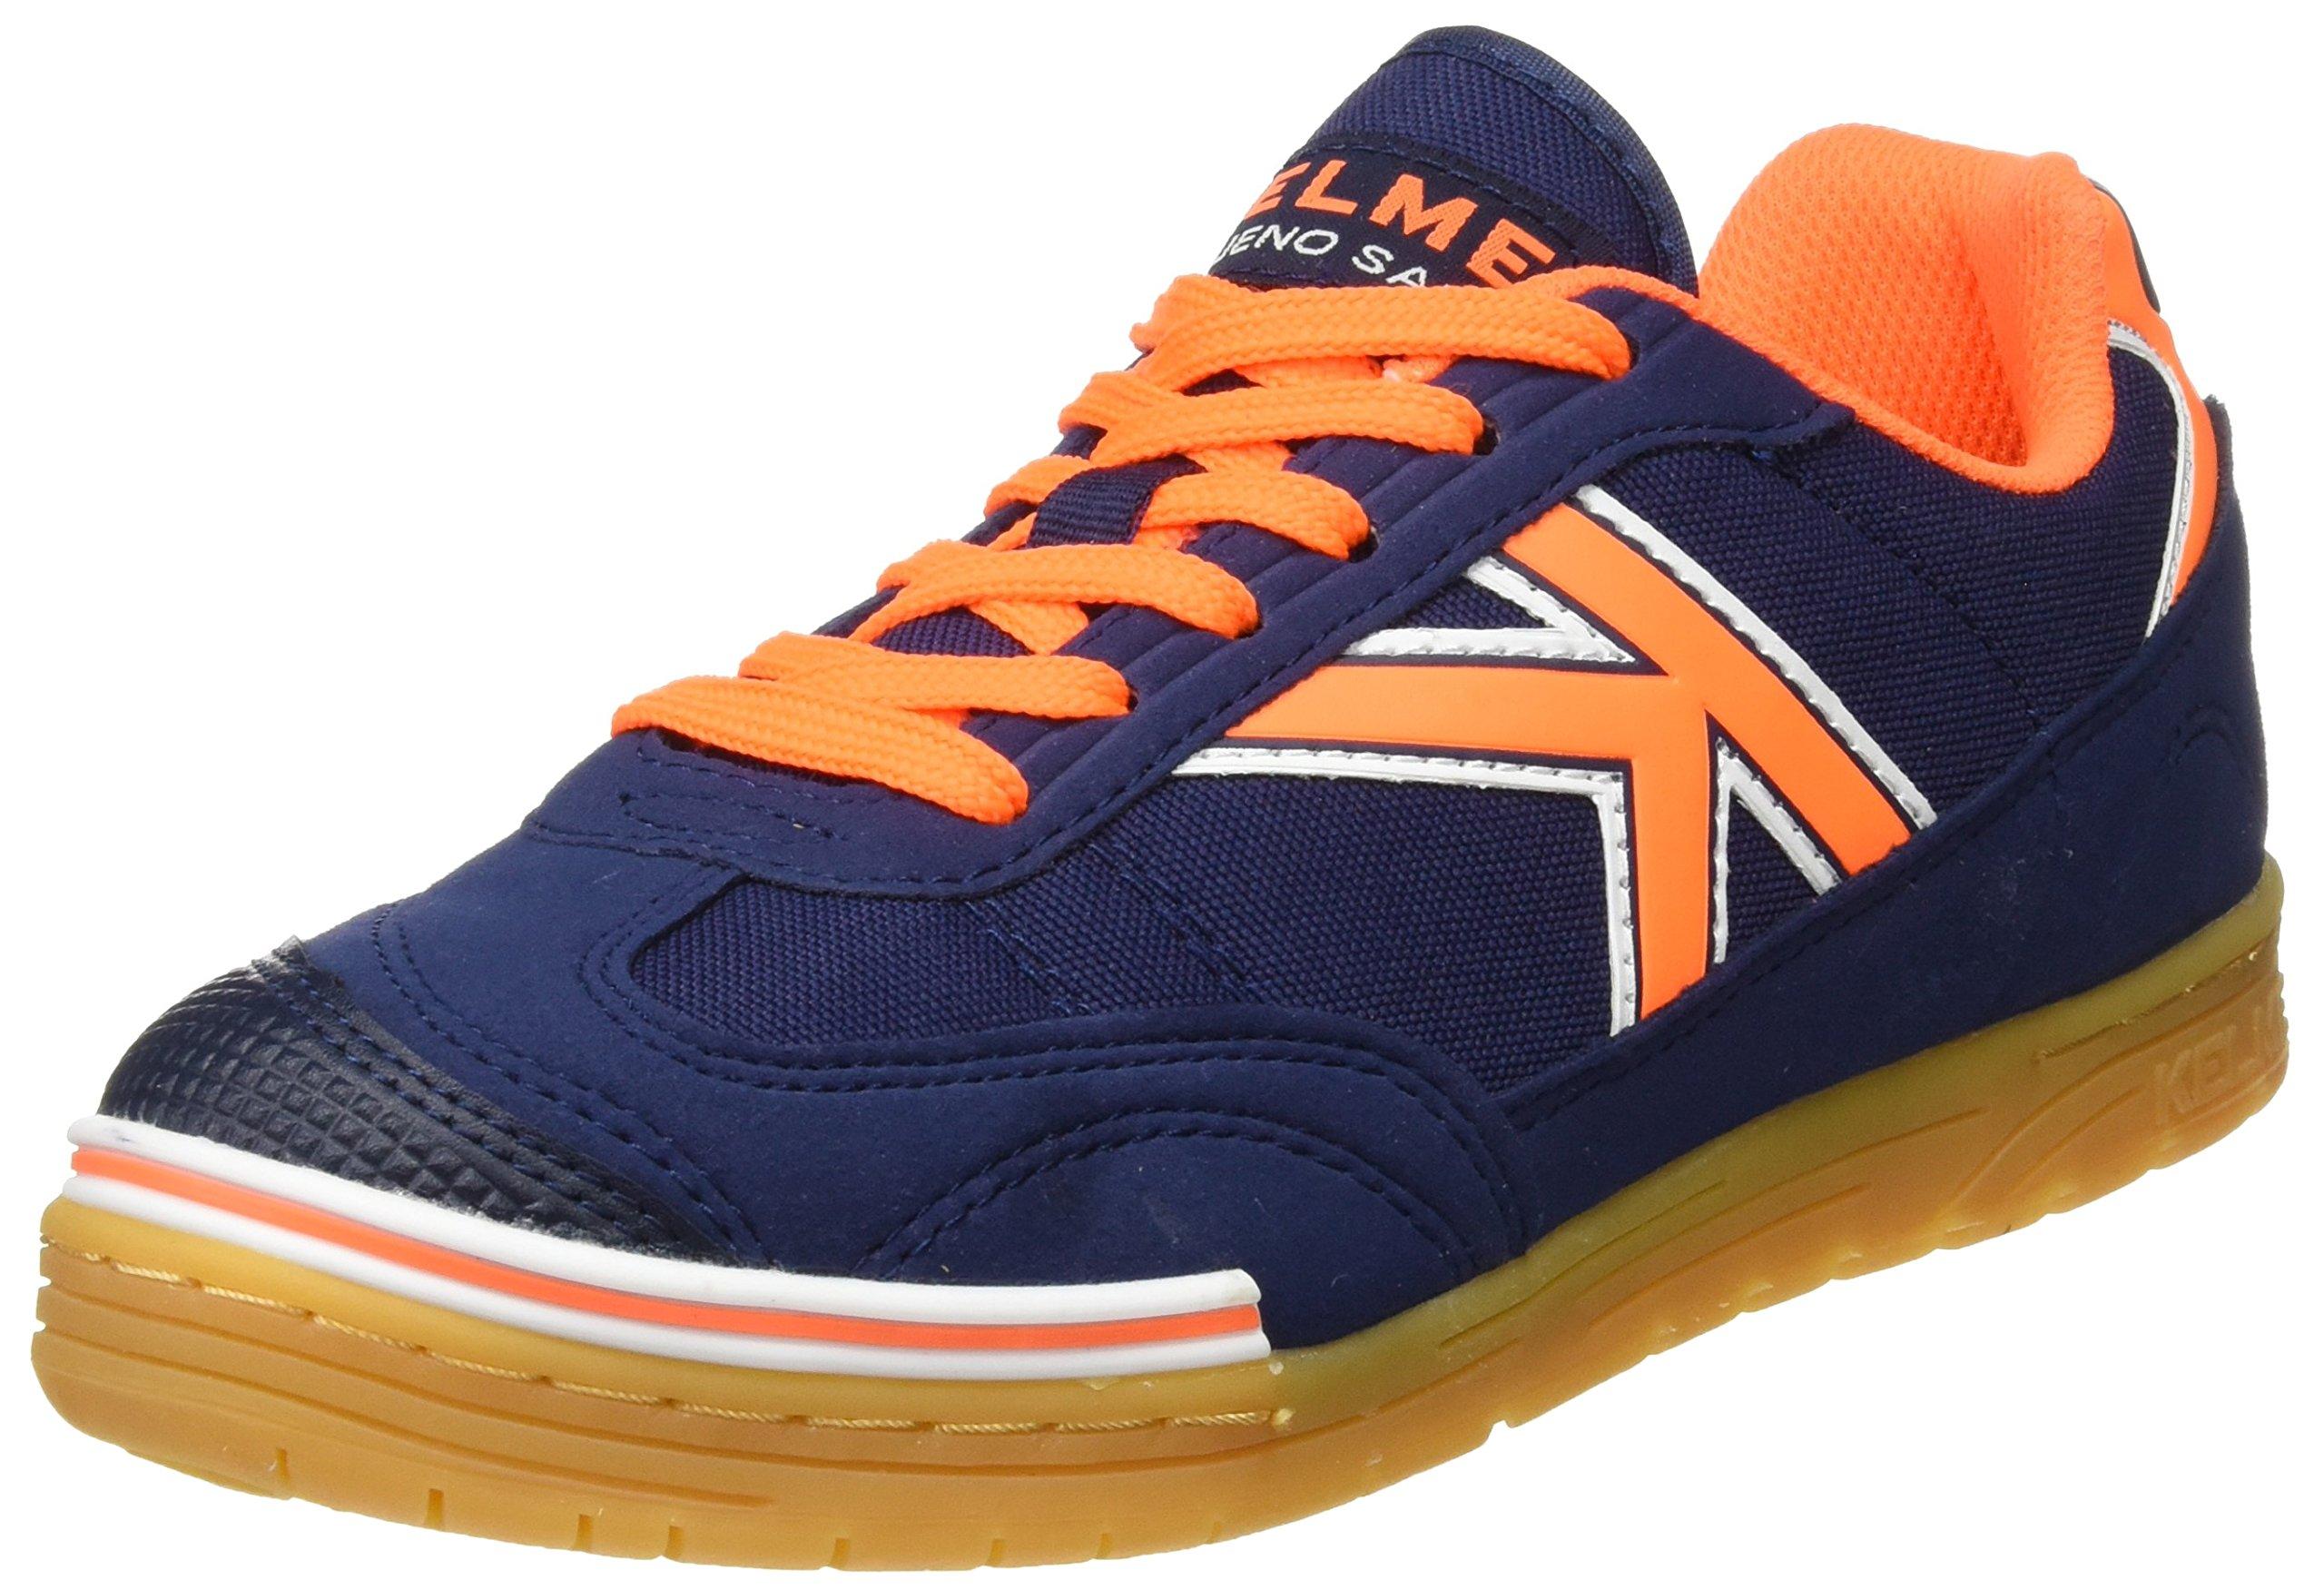 AdulteBleumarino SalaSneakers Kelme Basses Mixte naranja37 Trueno Eu vm0Nnw8